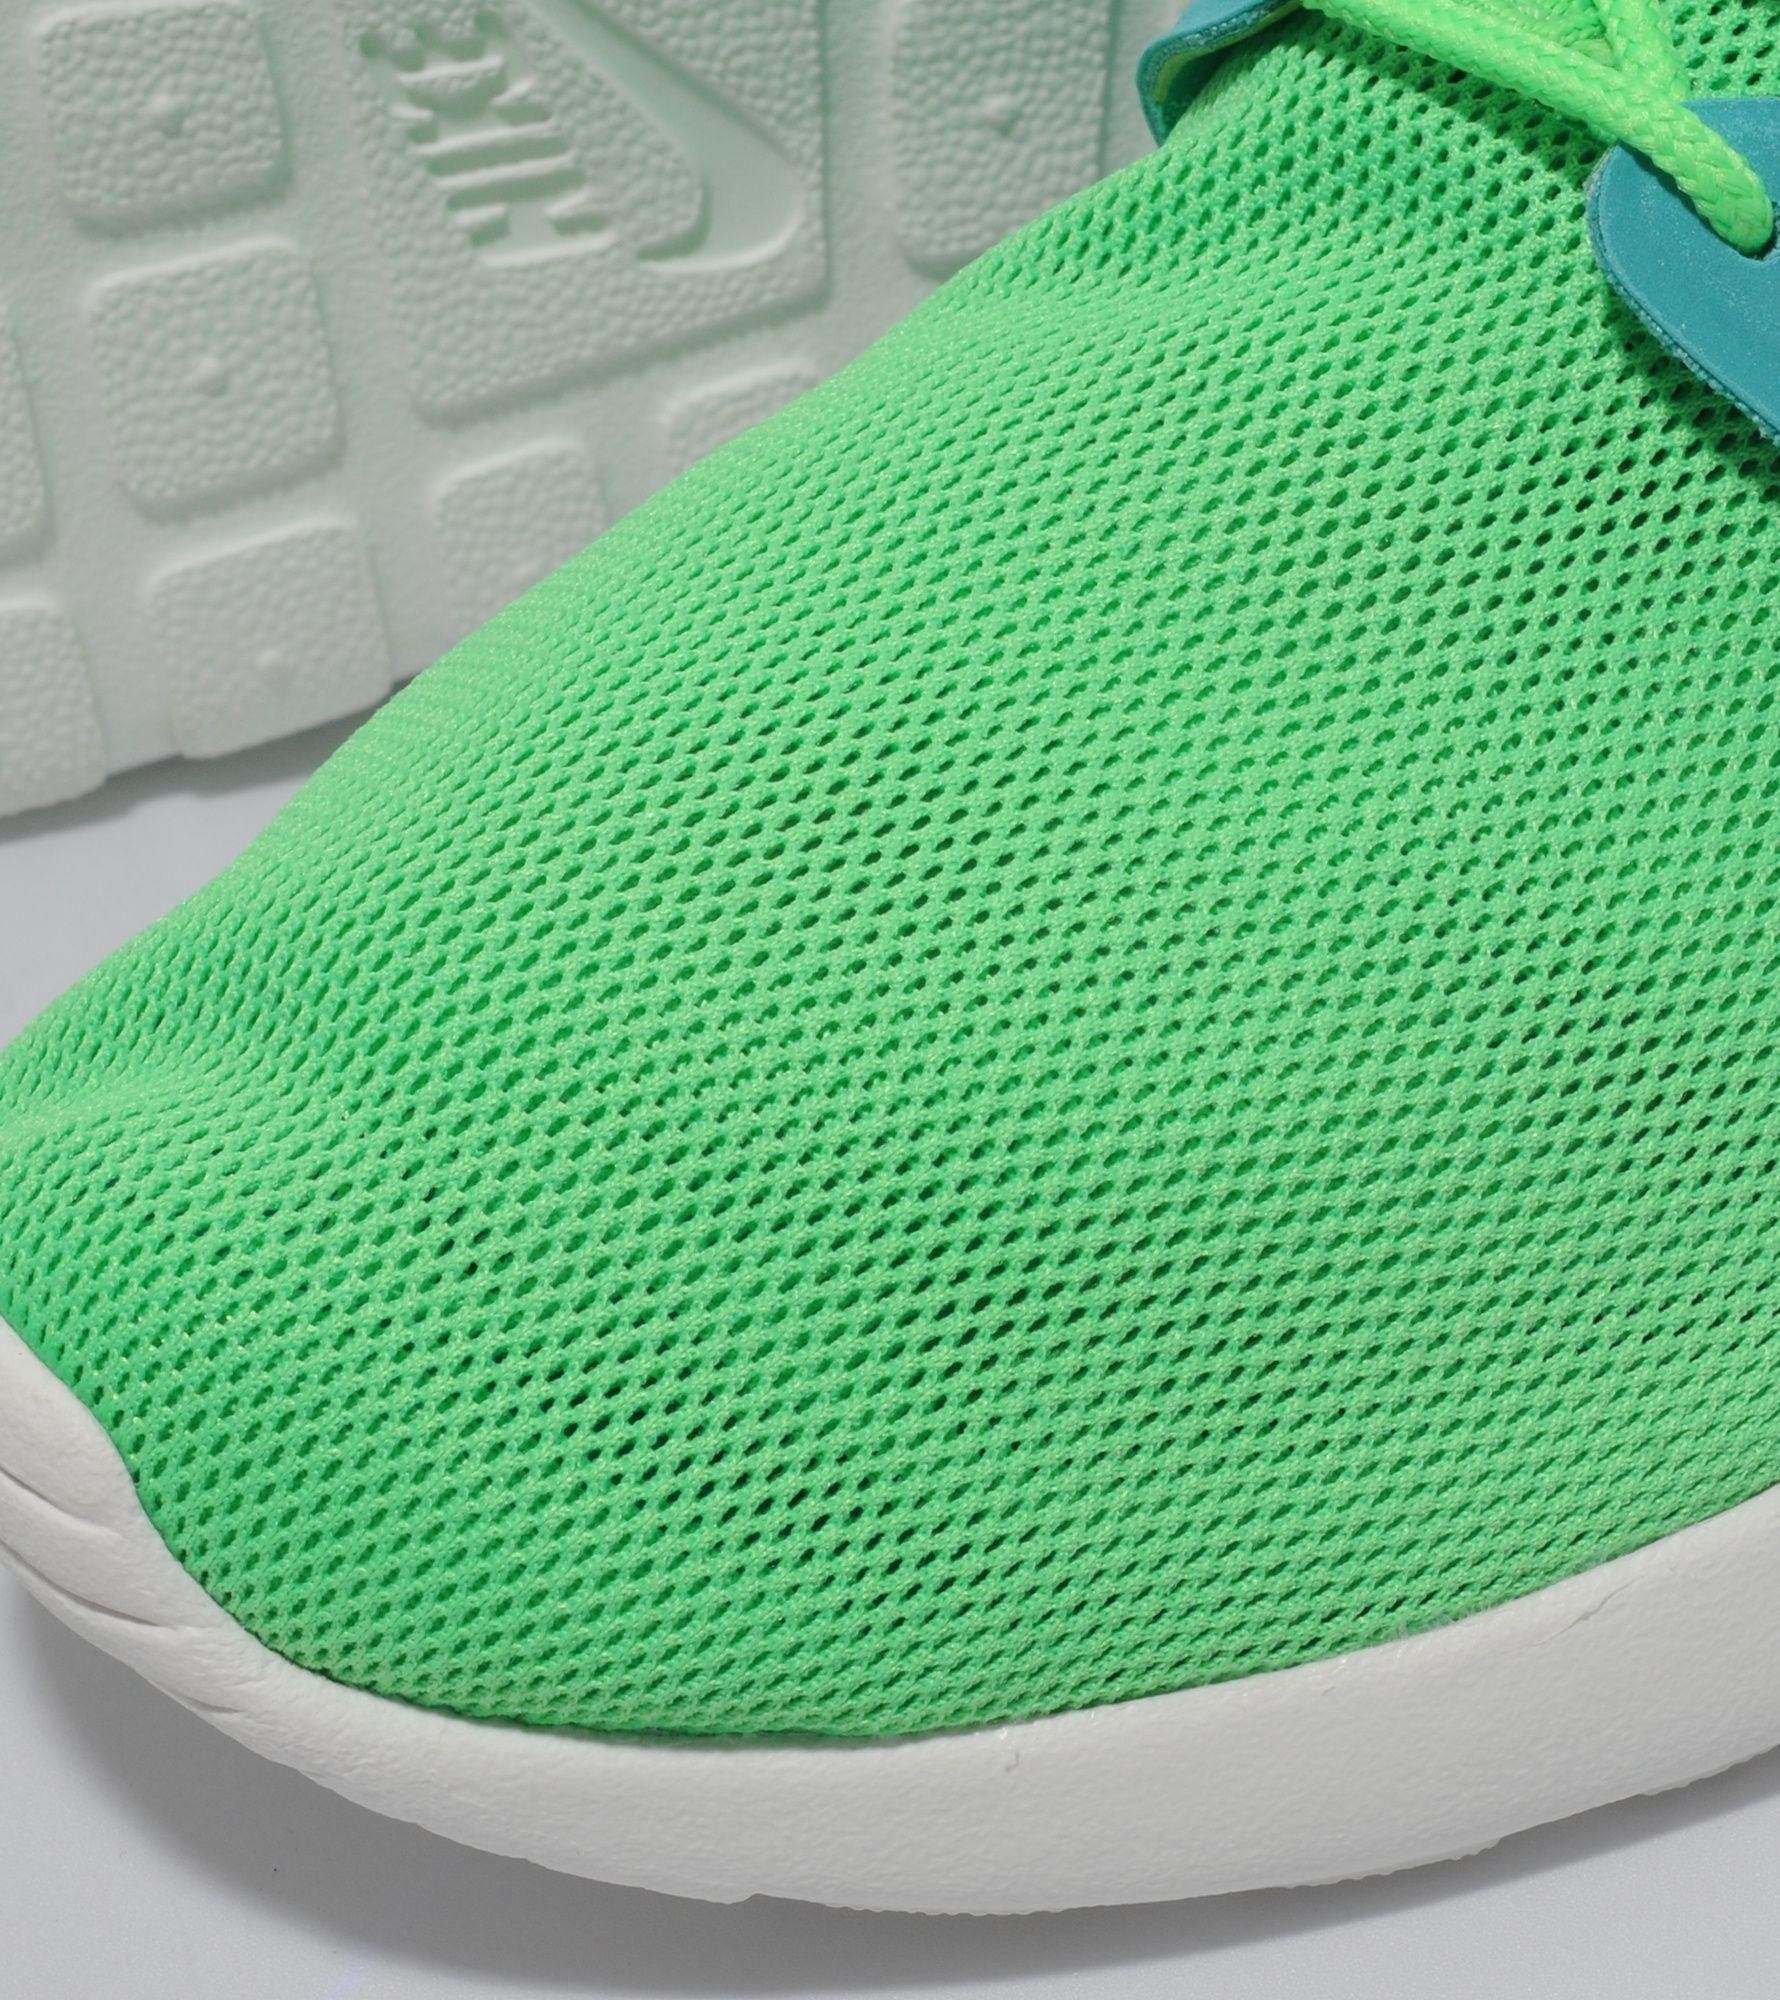 lfmyz Nike Roshe Run Hyperfuse QS | Size?